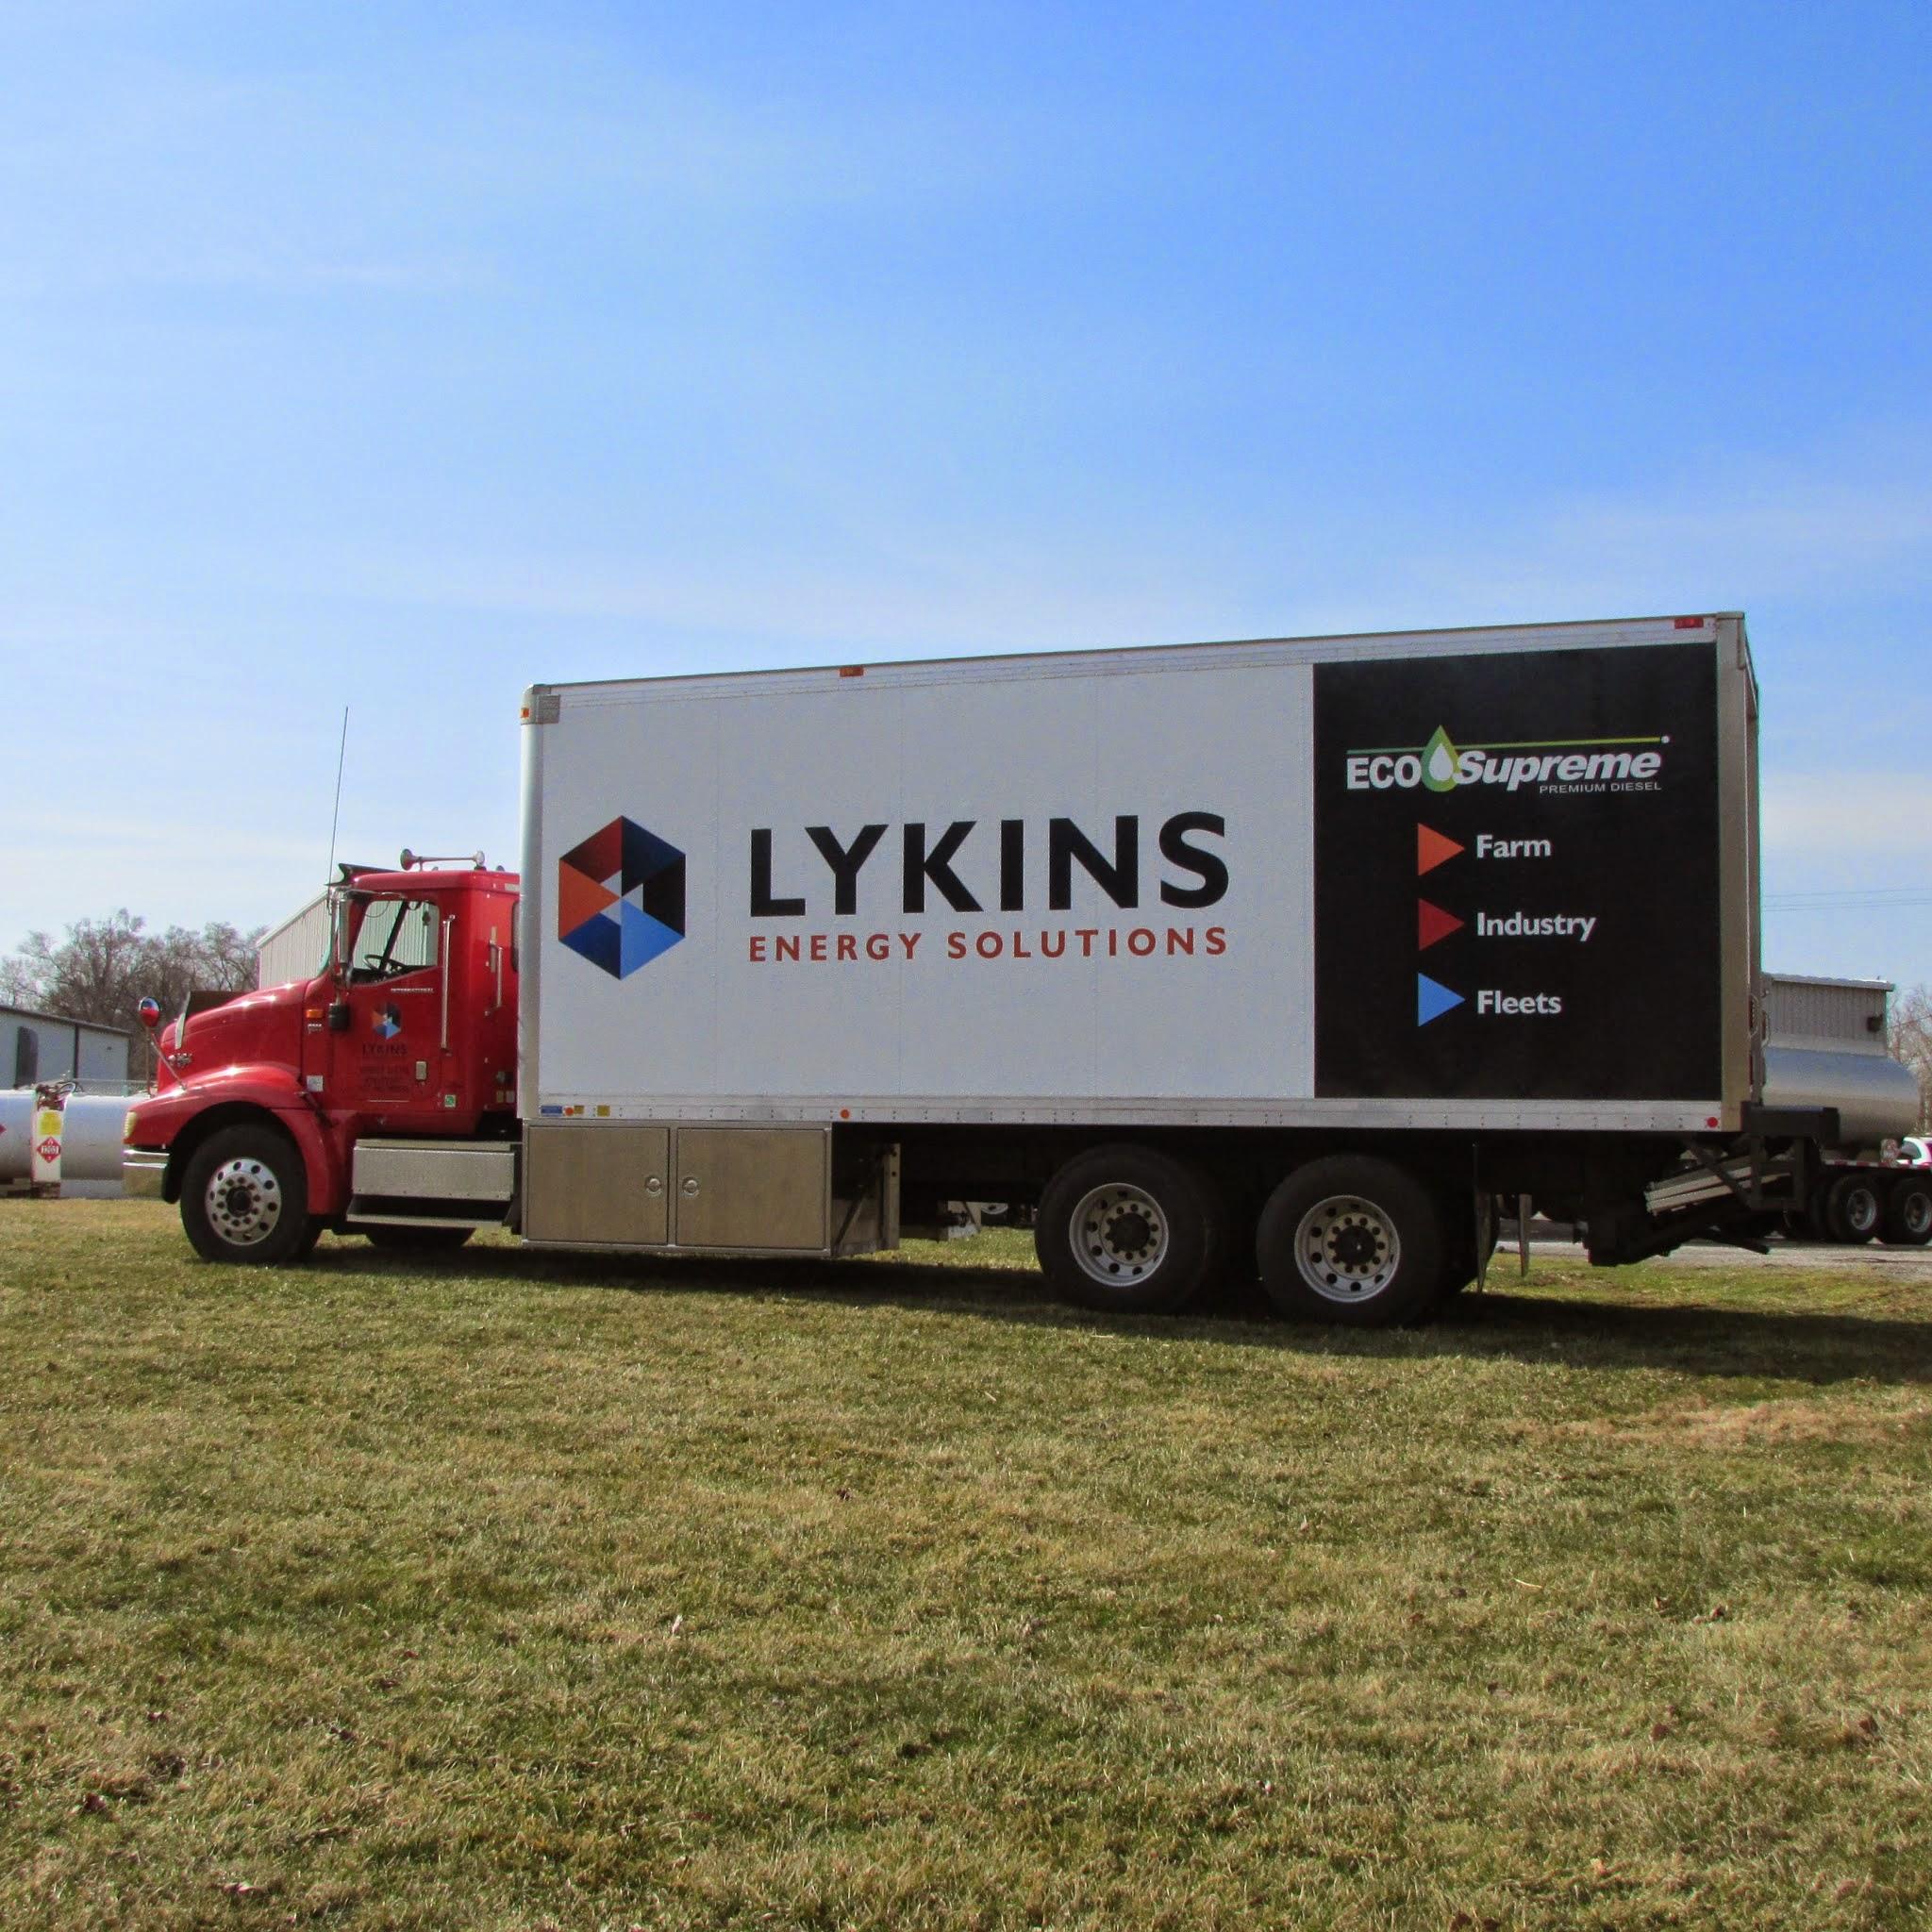 Lykins Energy Solutions image 4